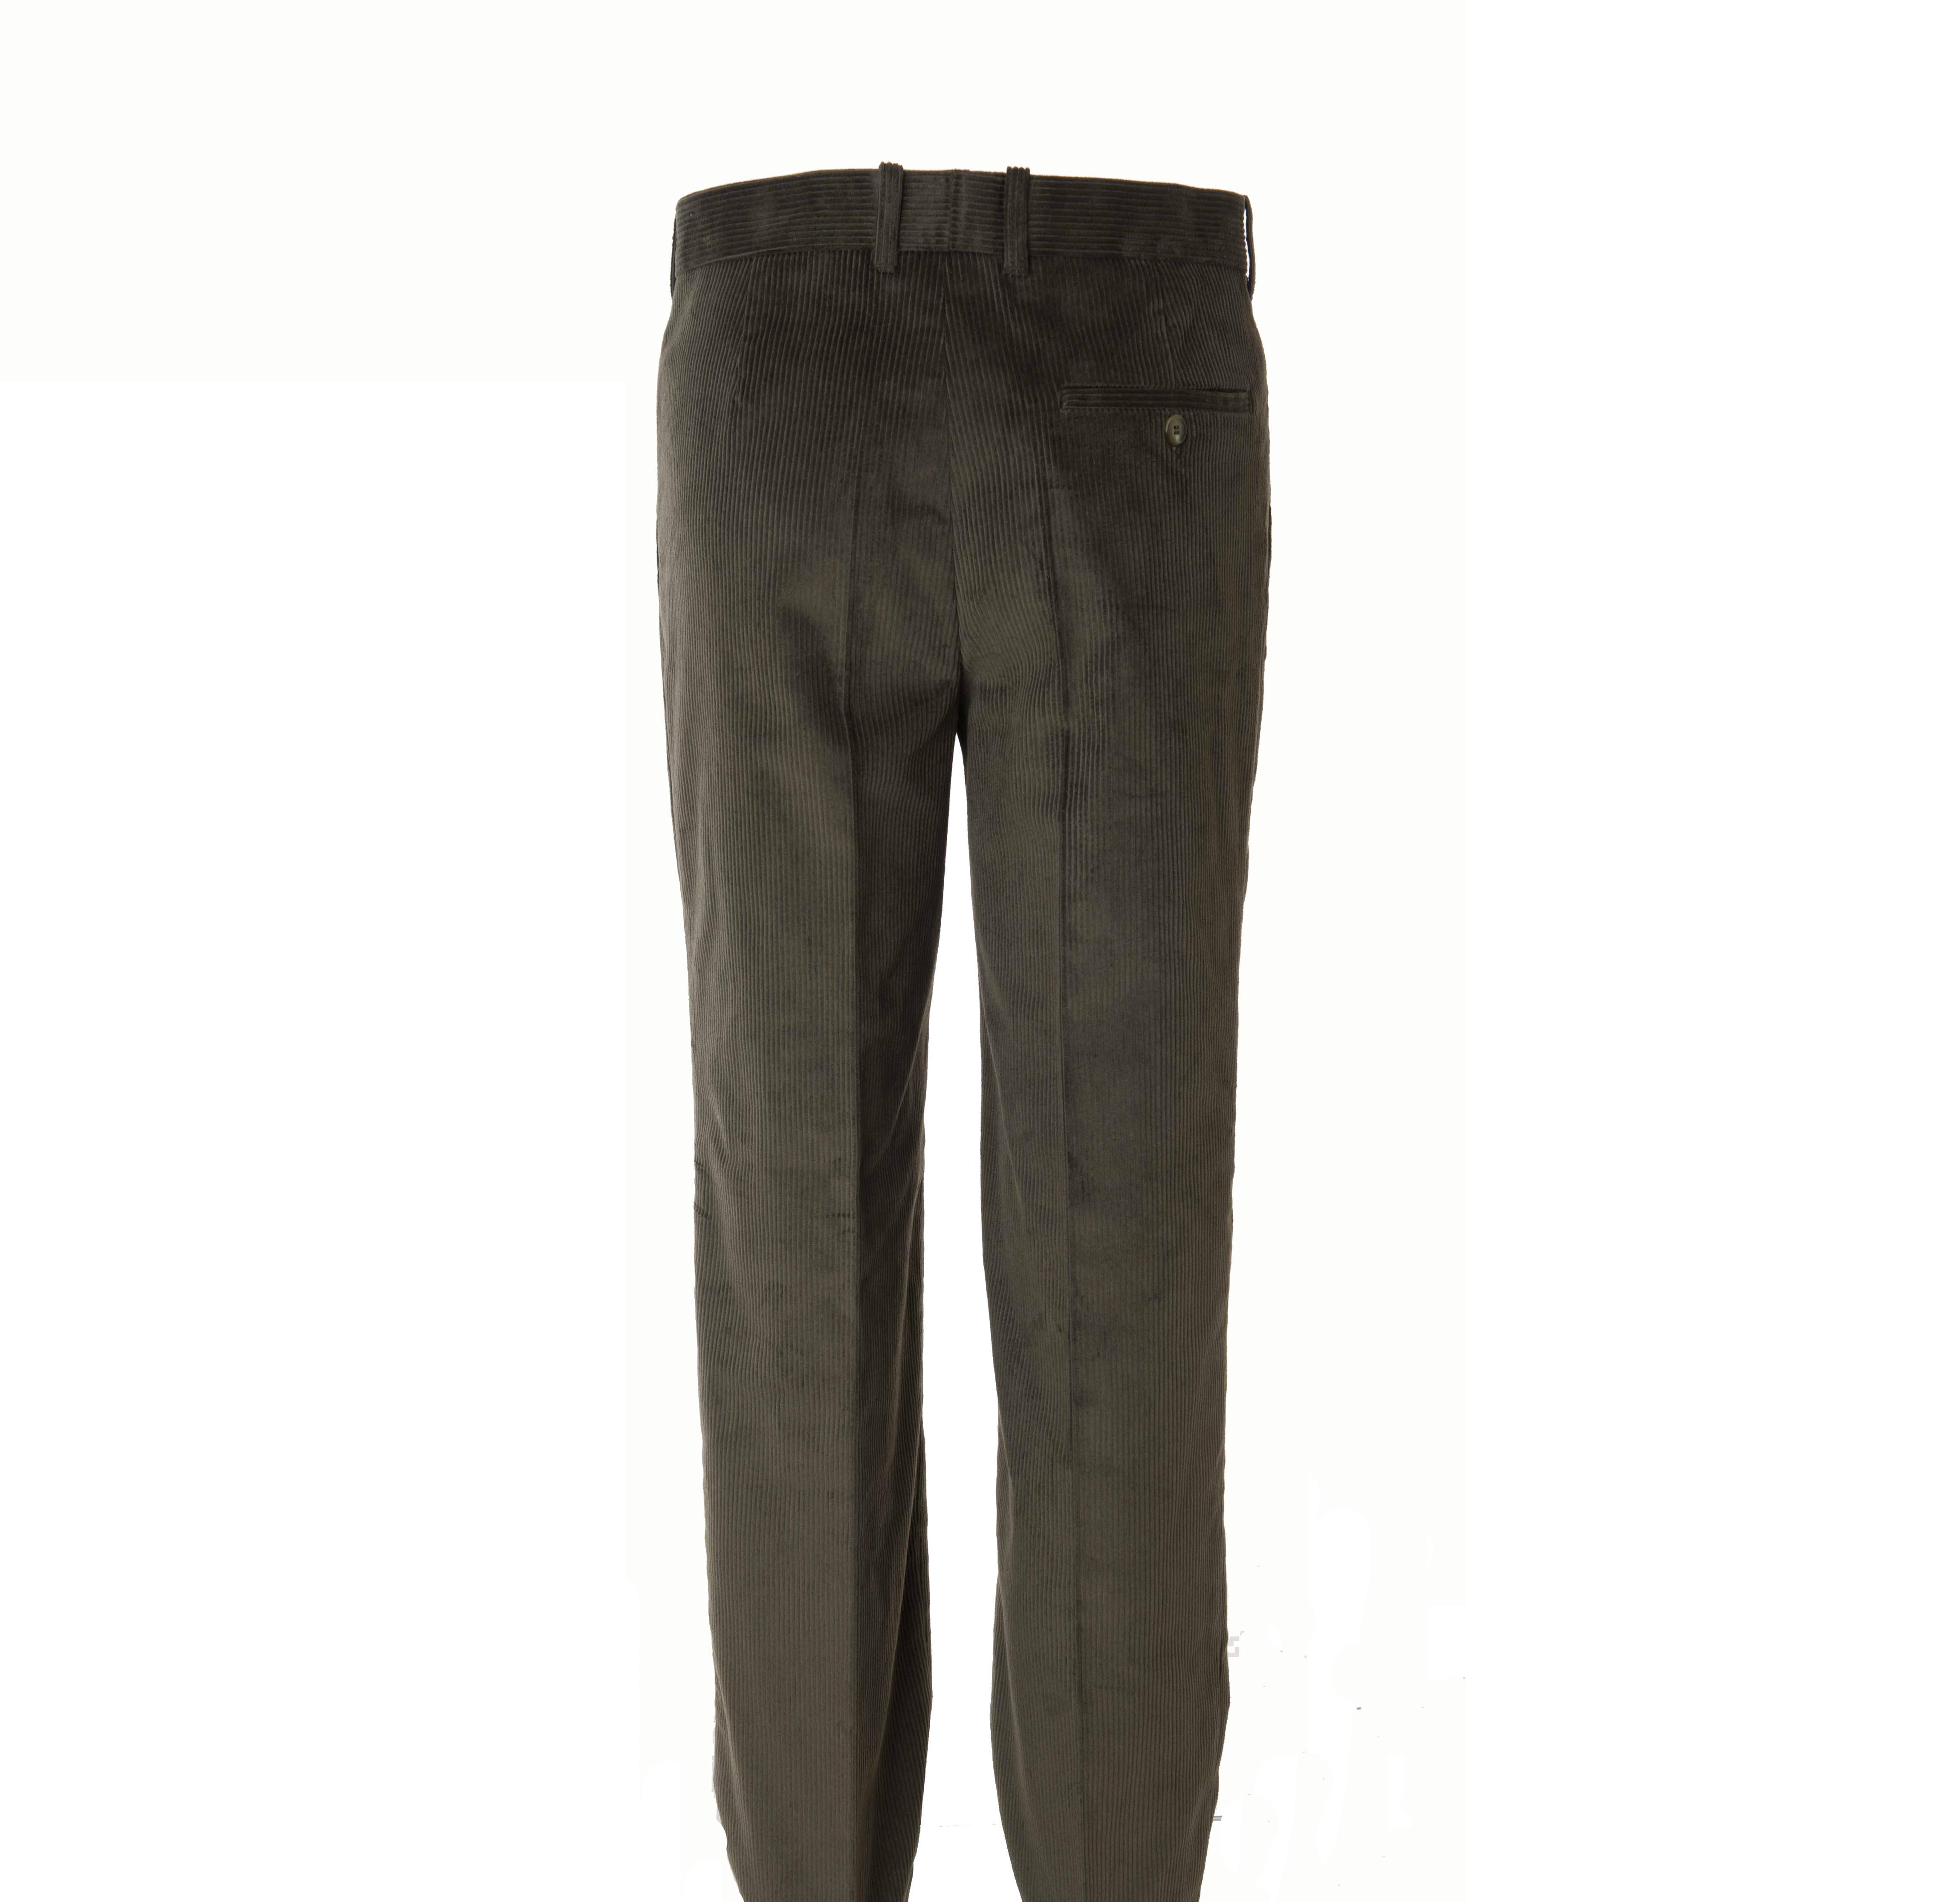 Pantalon De Pana Modelo Hombre Pantalones Blaper